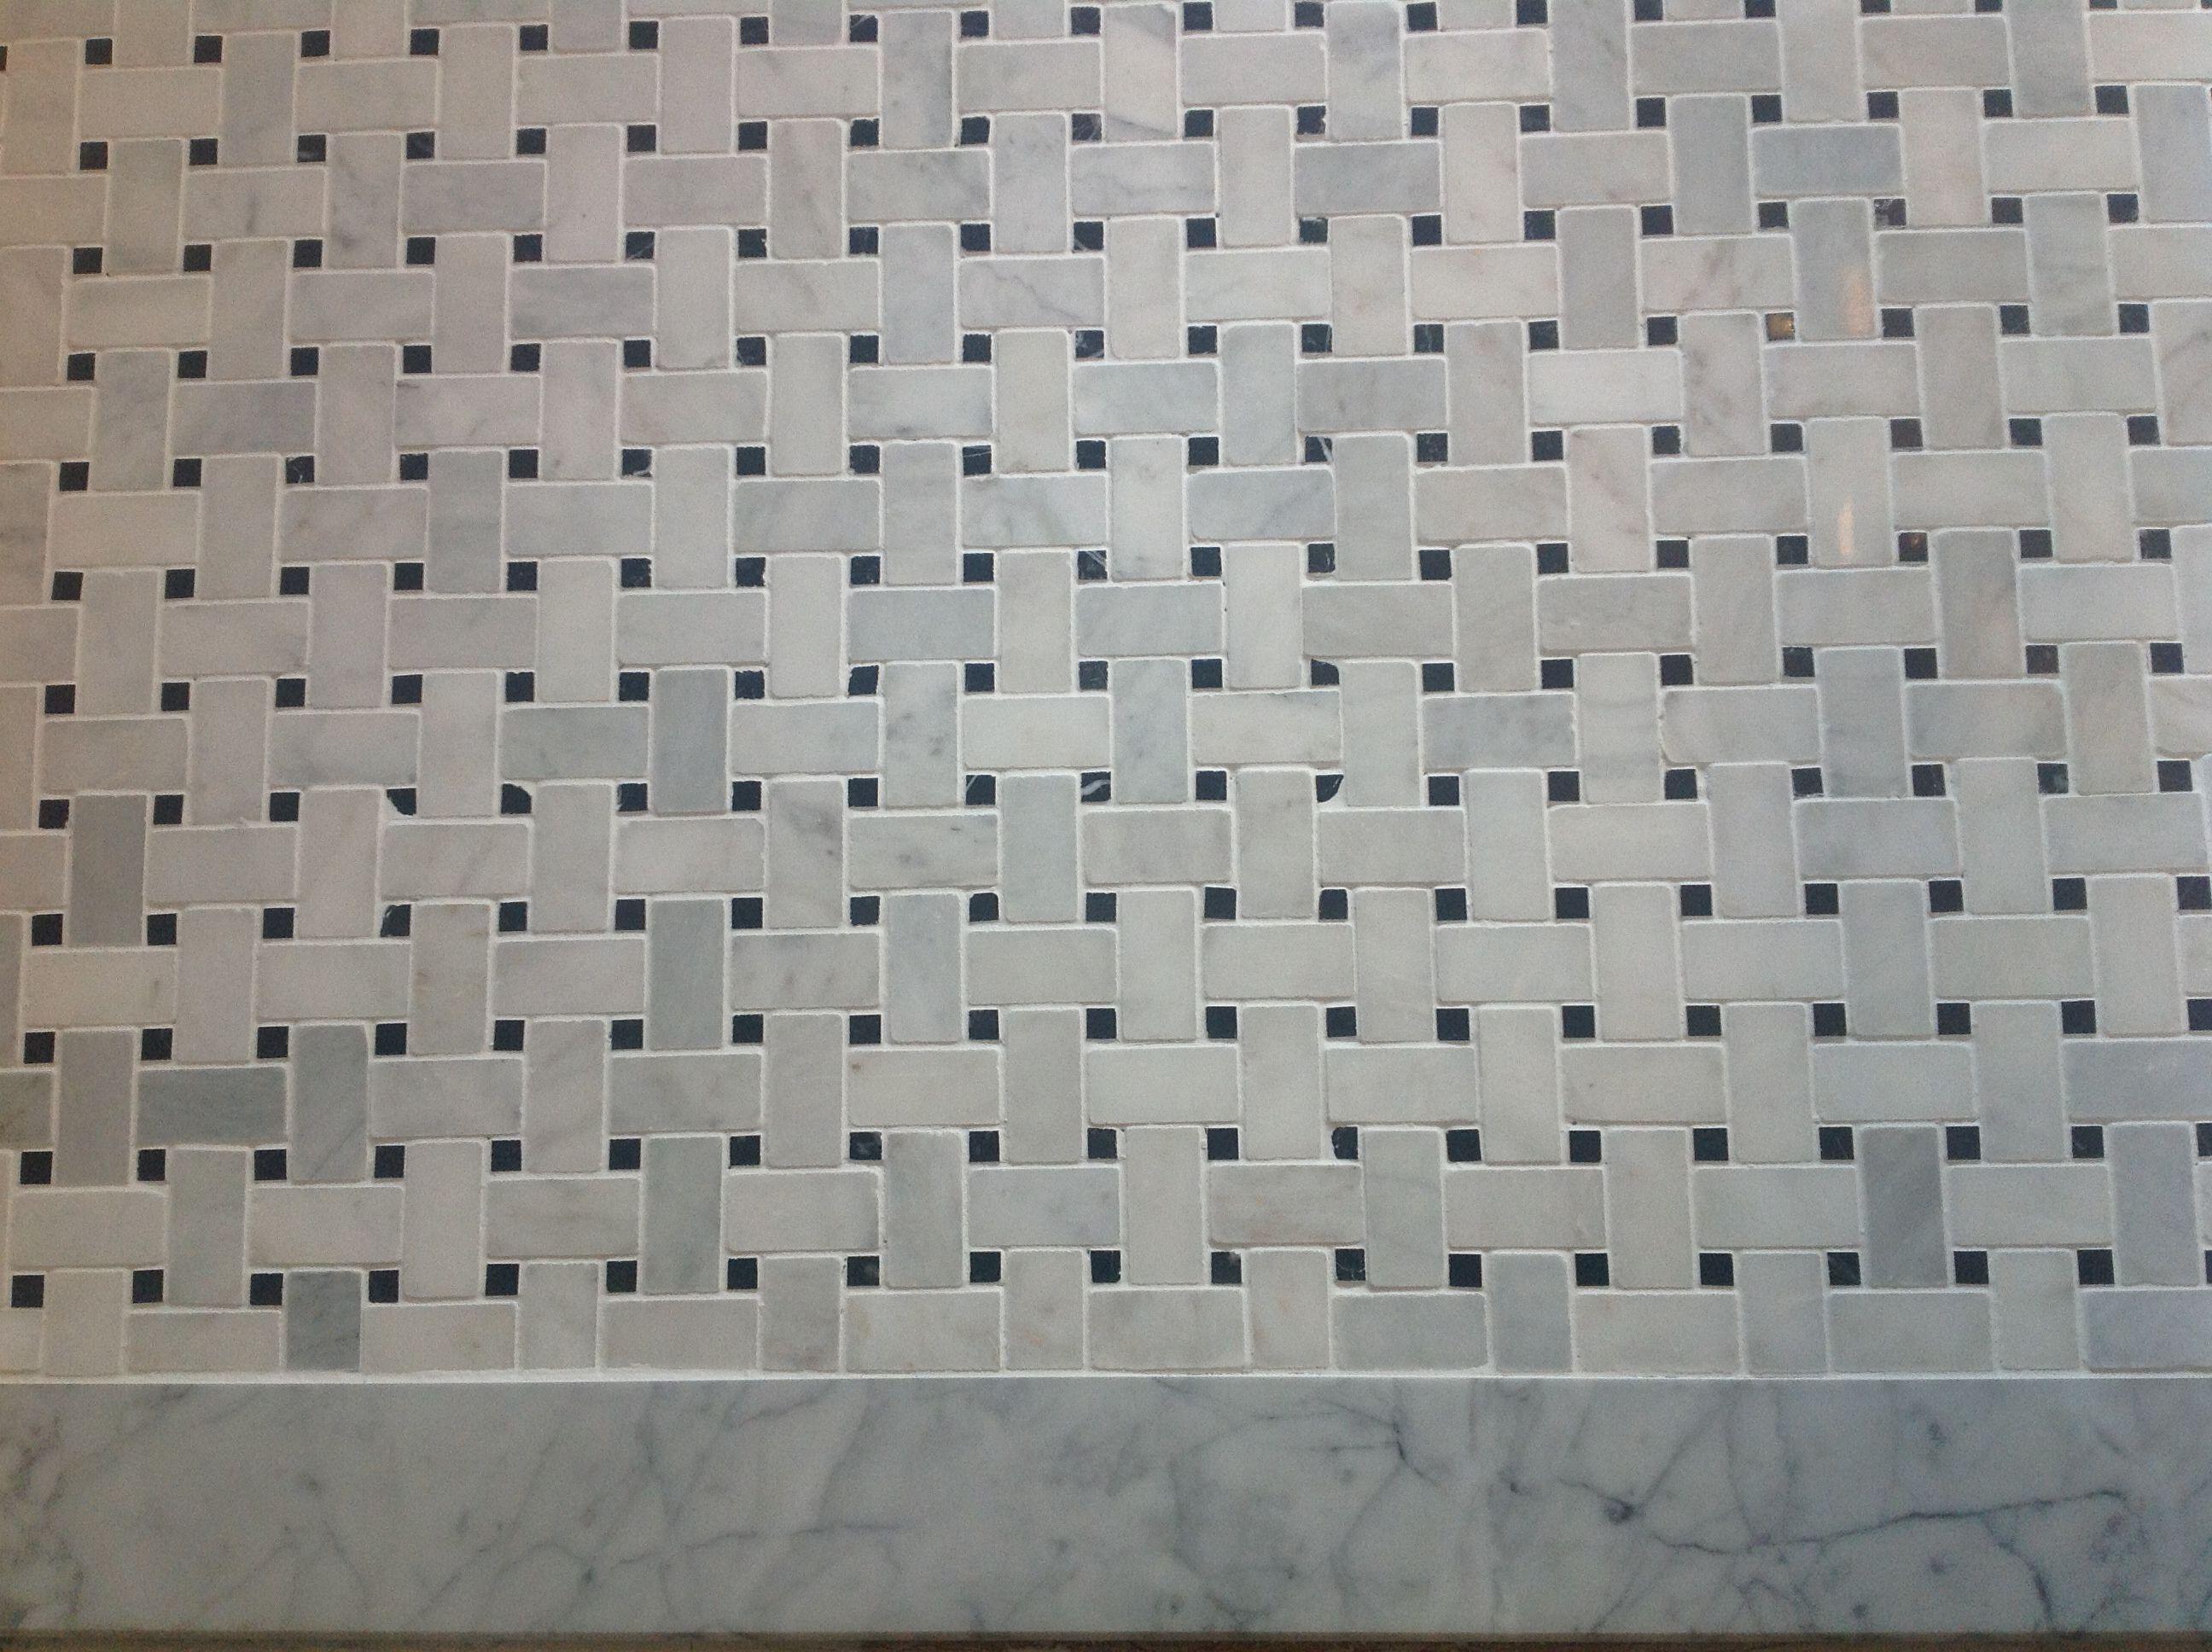 Marble Flooring Bathroom Black And White Flooring Part Ii Bathroom Flooring Carrara